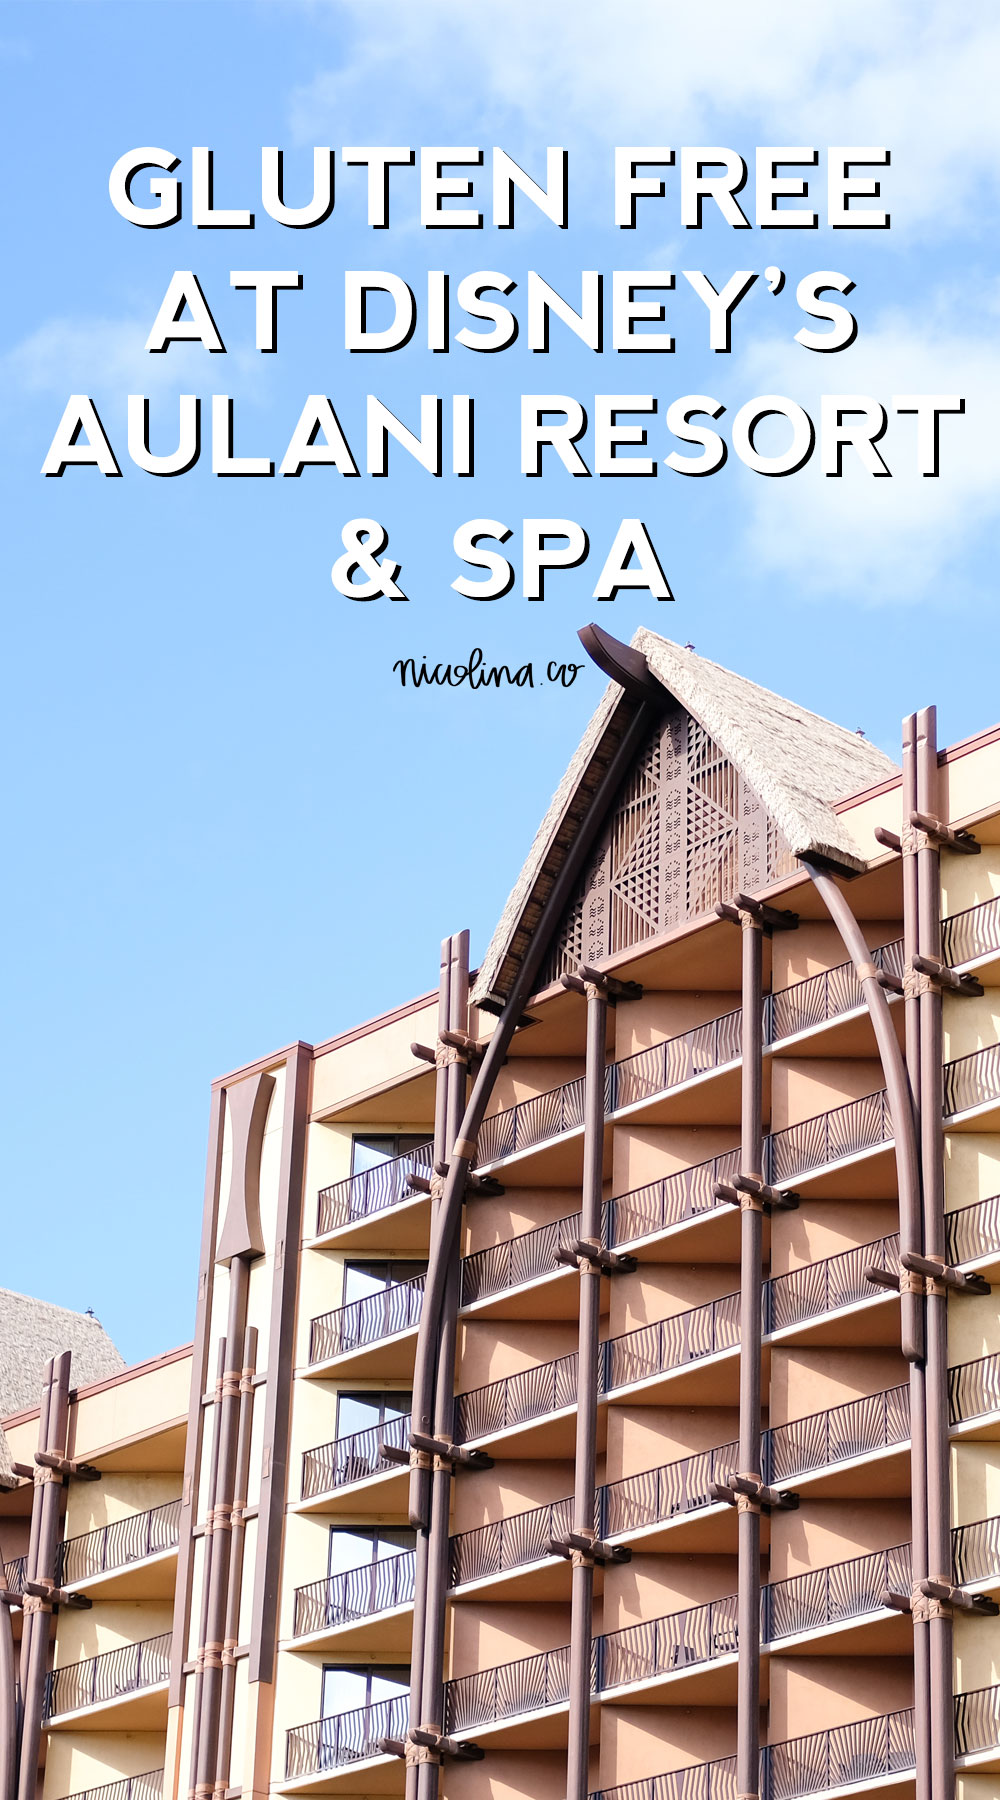 Gluten Free at Disney's Aulani Resort and Spa